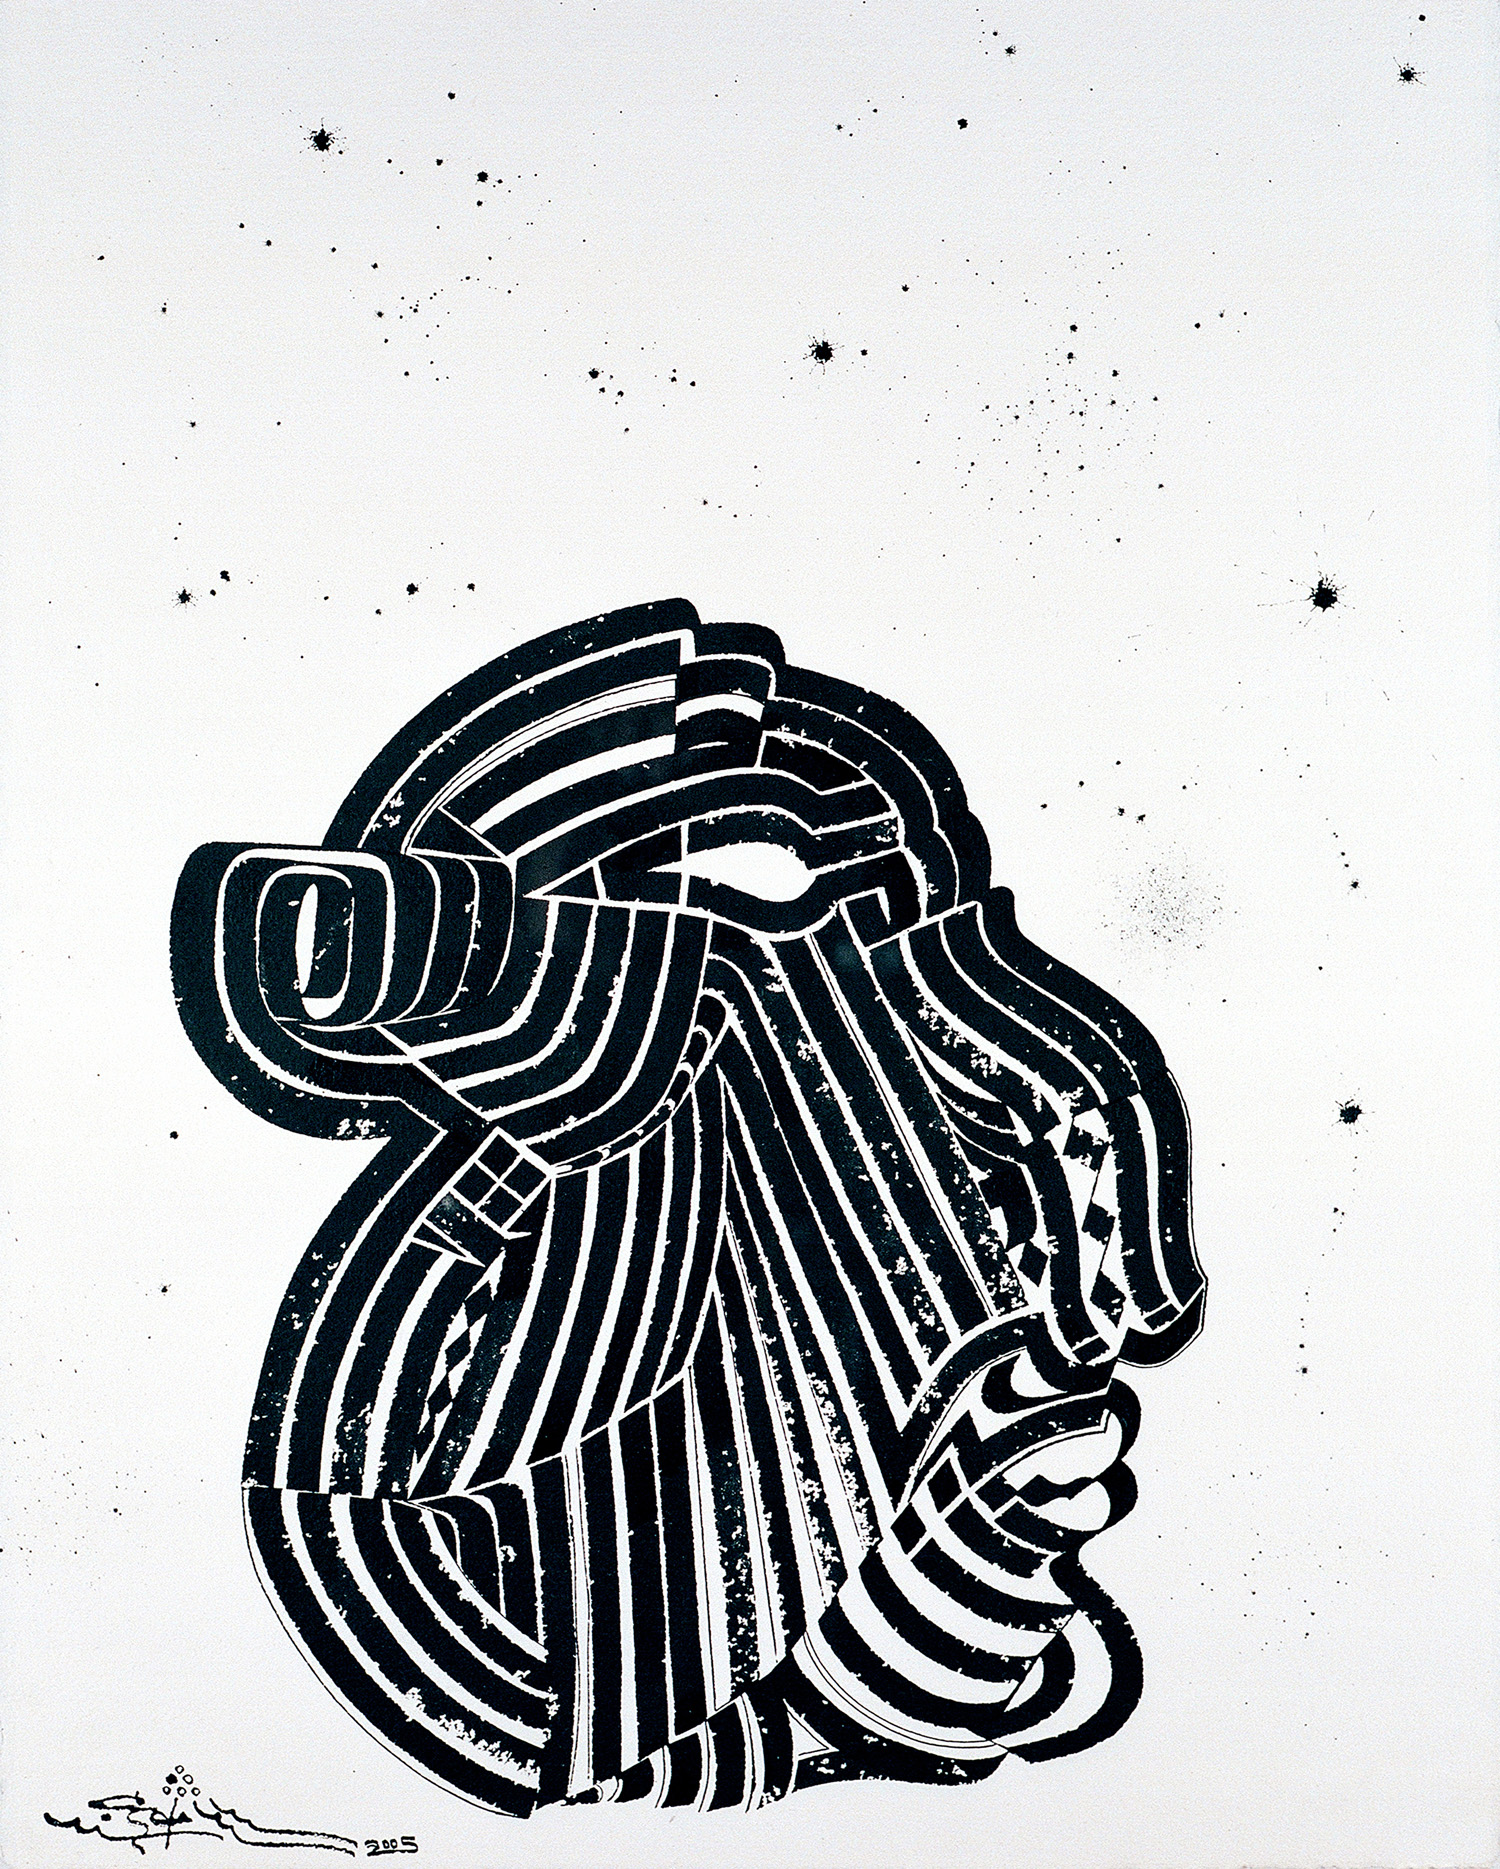 Headmaster II, 2005 sumi ink on handmade paper 30 x 22 inch